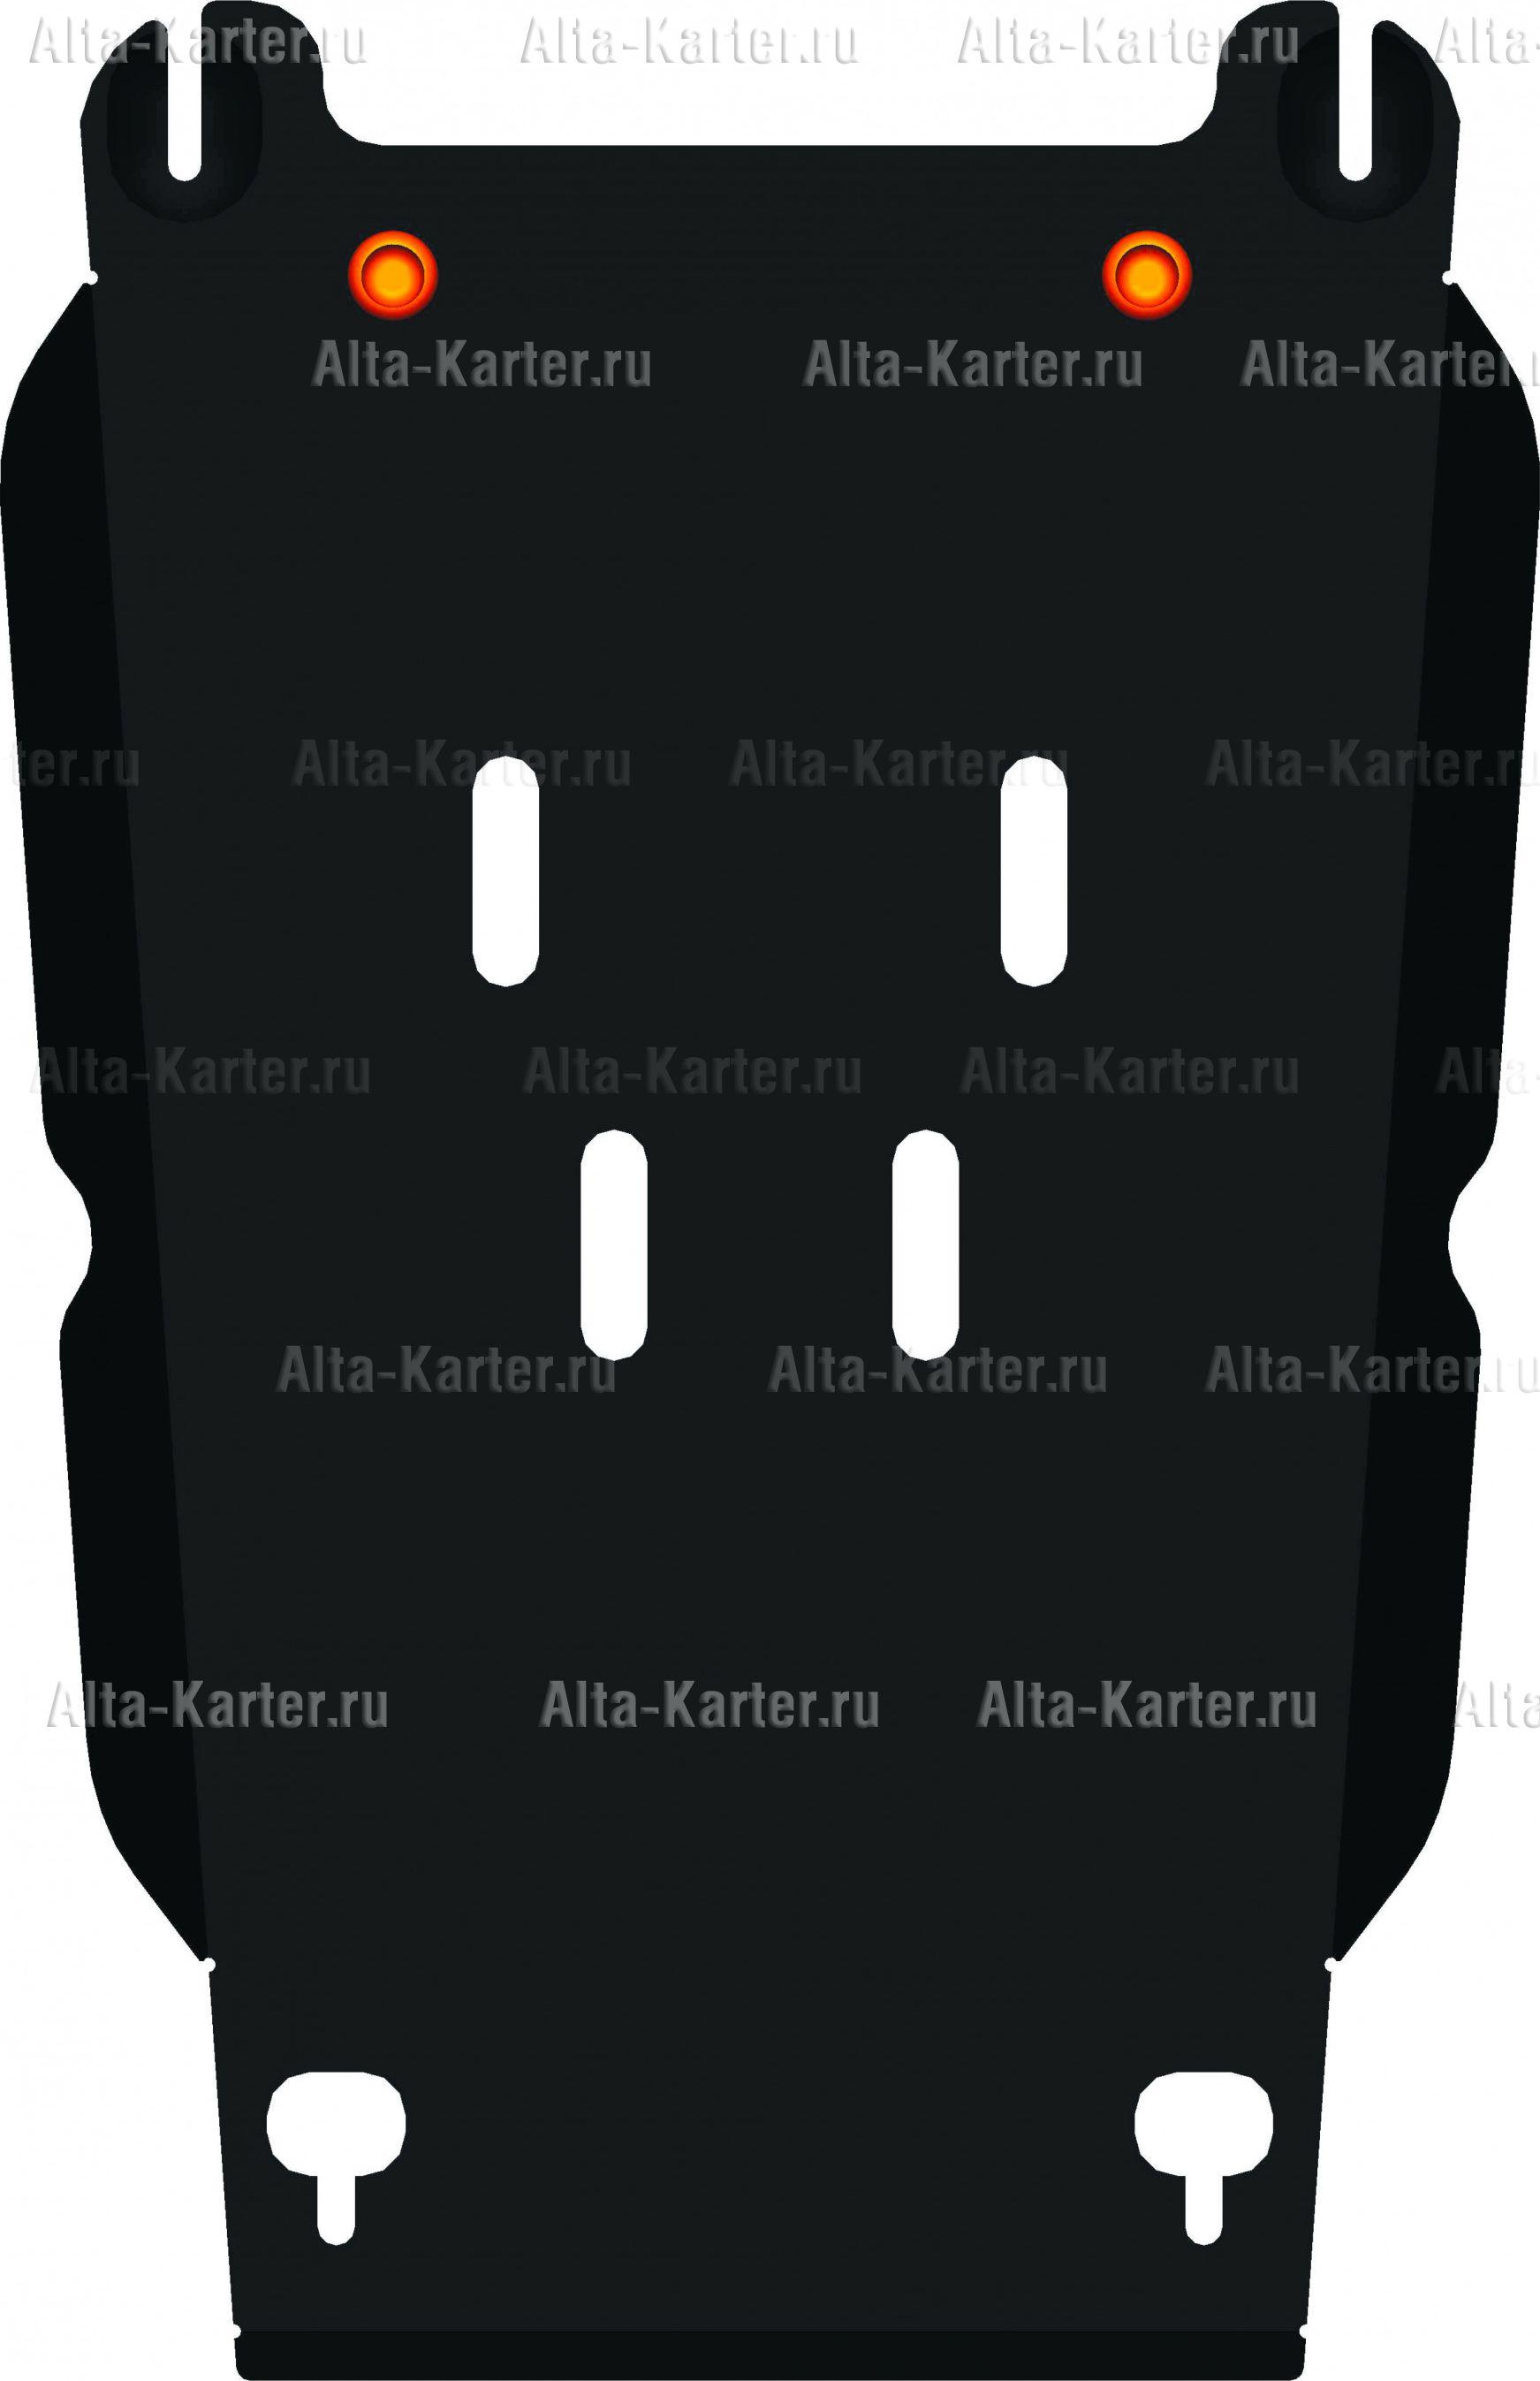 Защита Alfeco для КПП Chevrolet TrailBlazer II 2013-2021. Артикул ALF.03.20